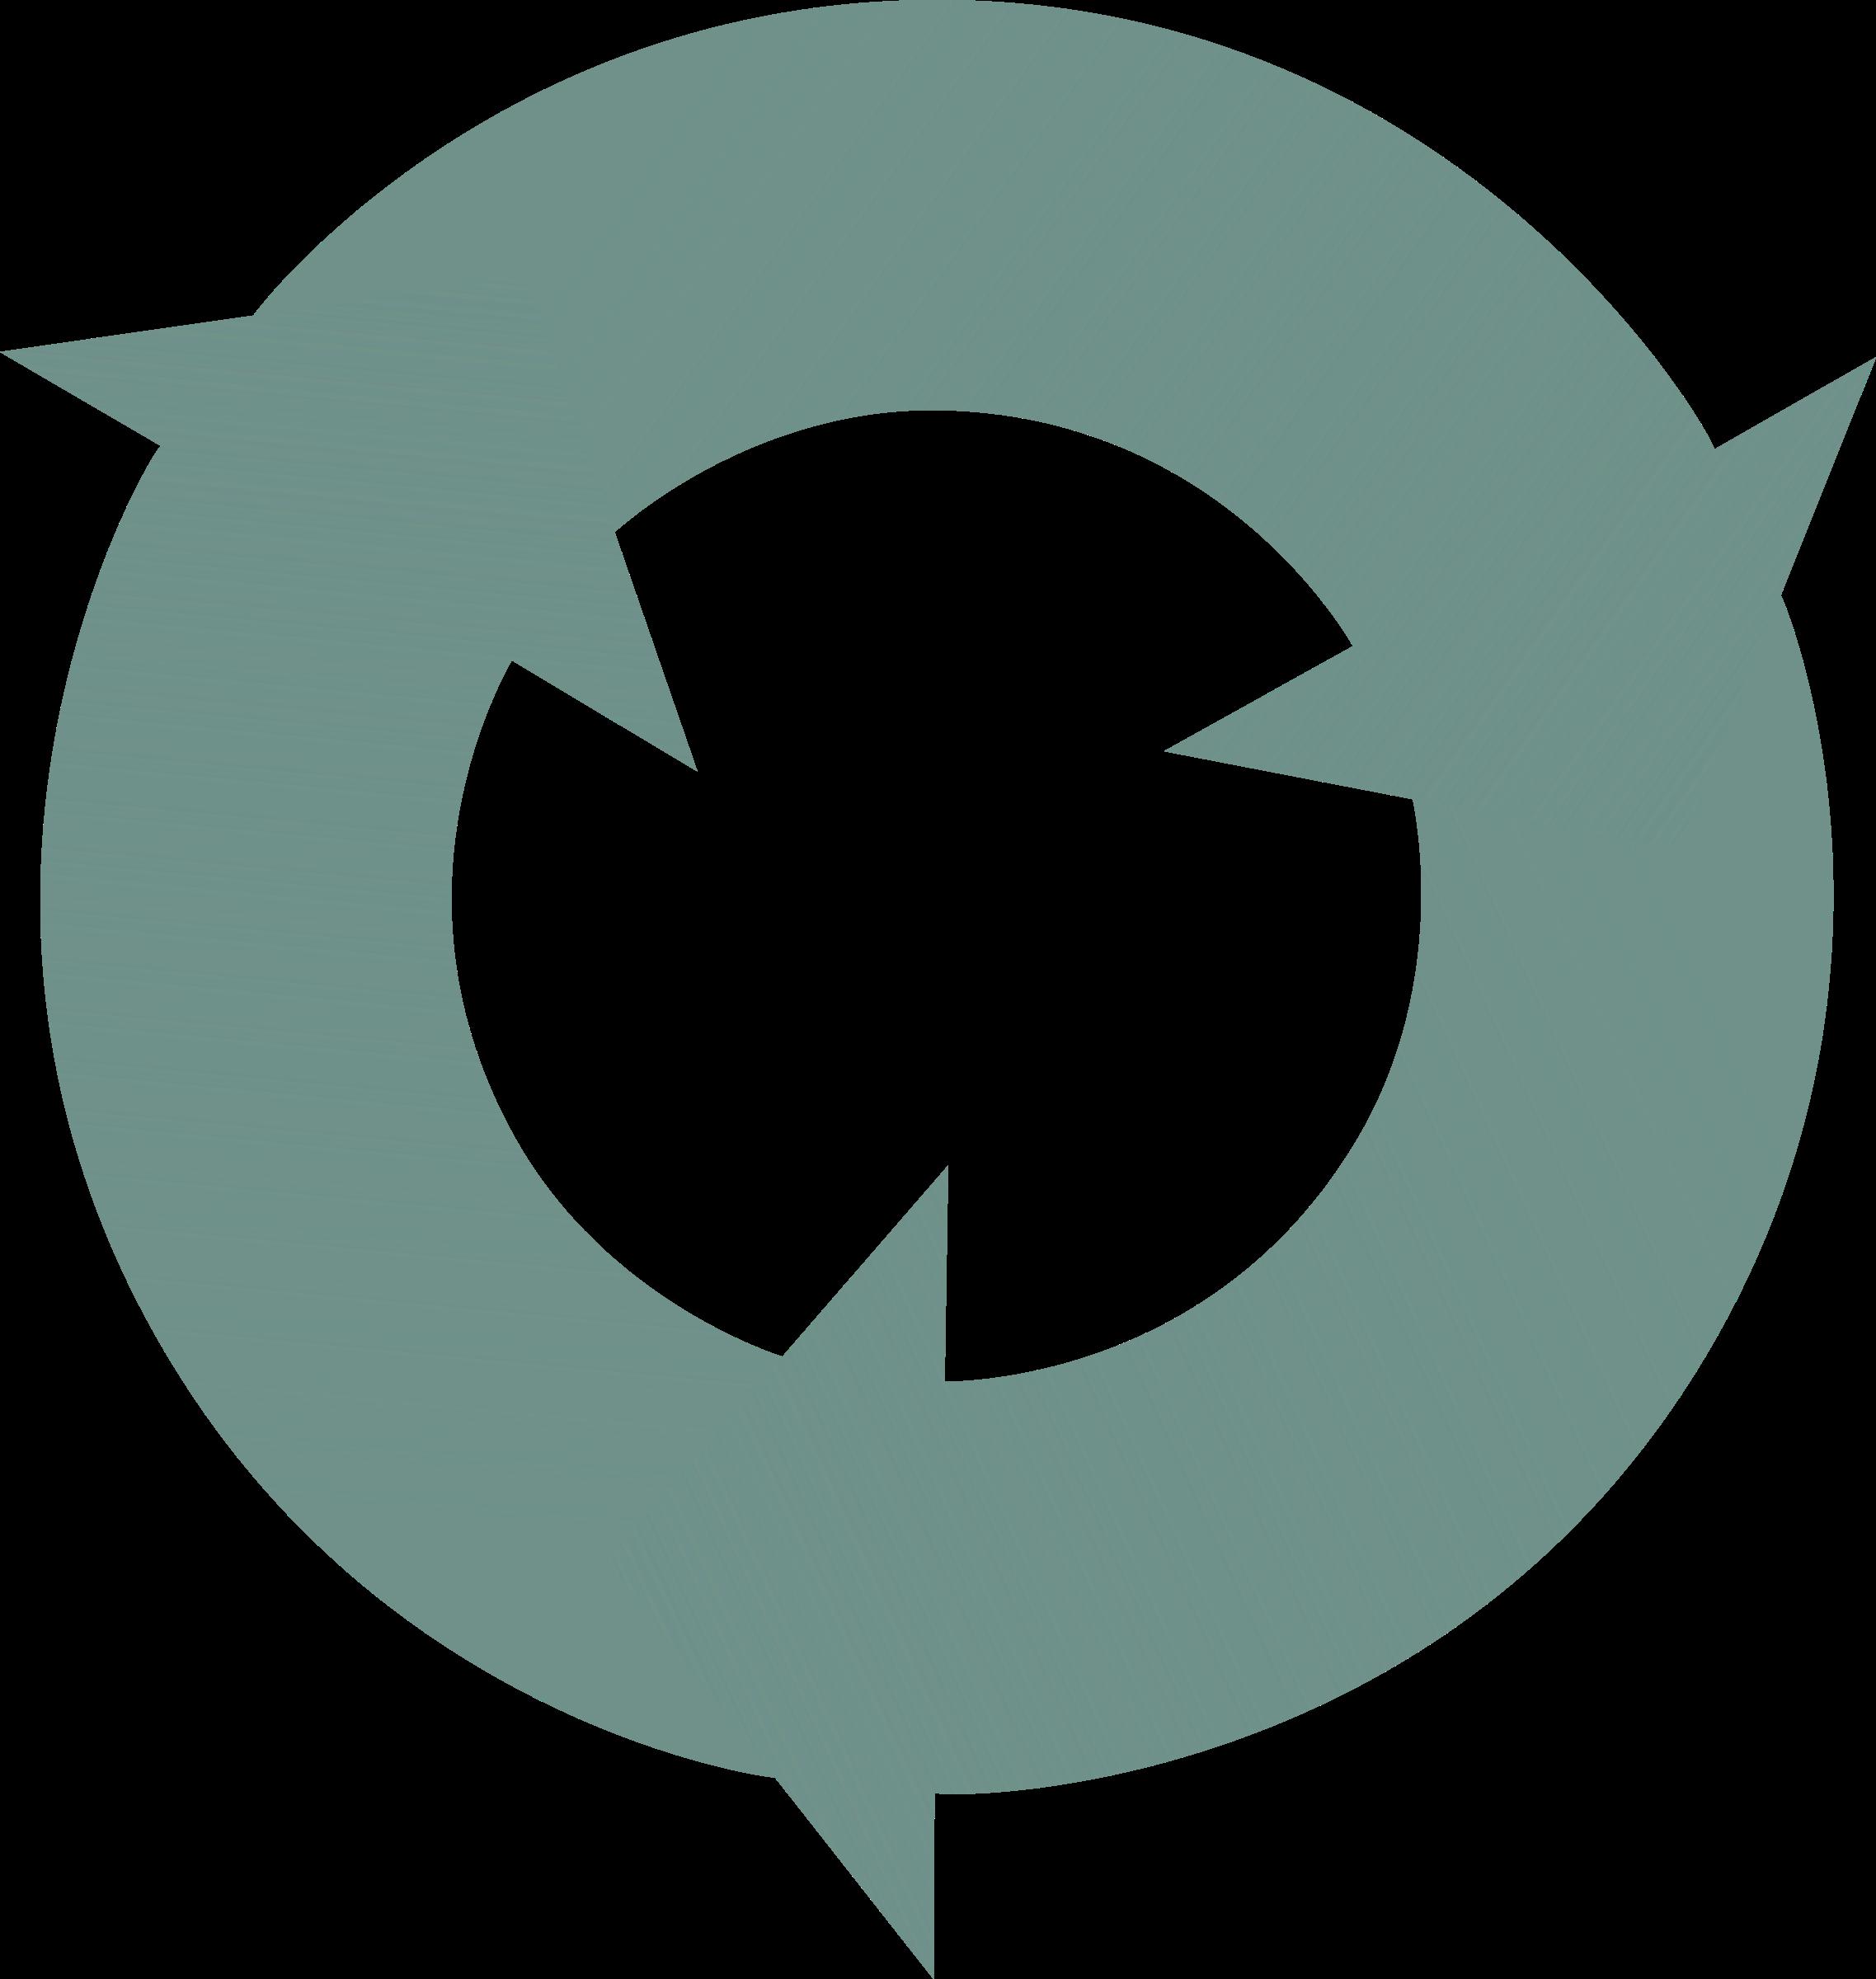 Arrow circle frames illustrations. Clipart arrows filigree